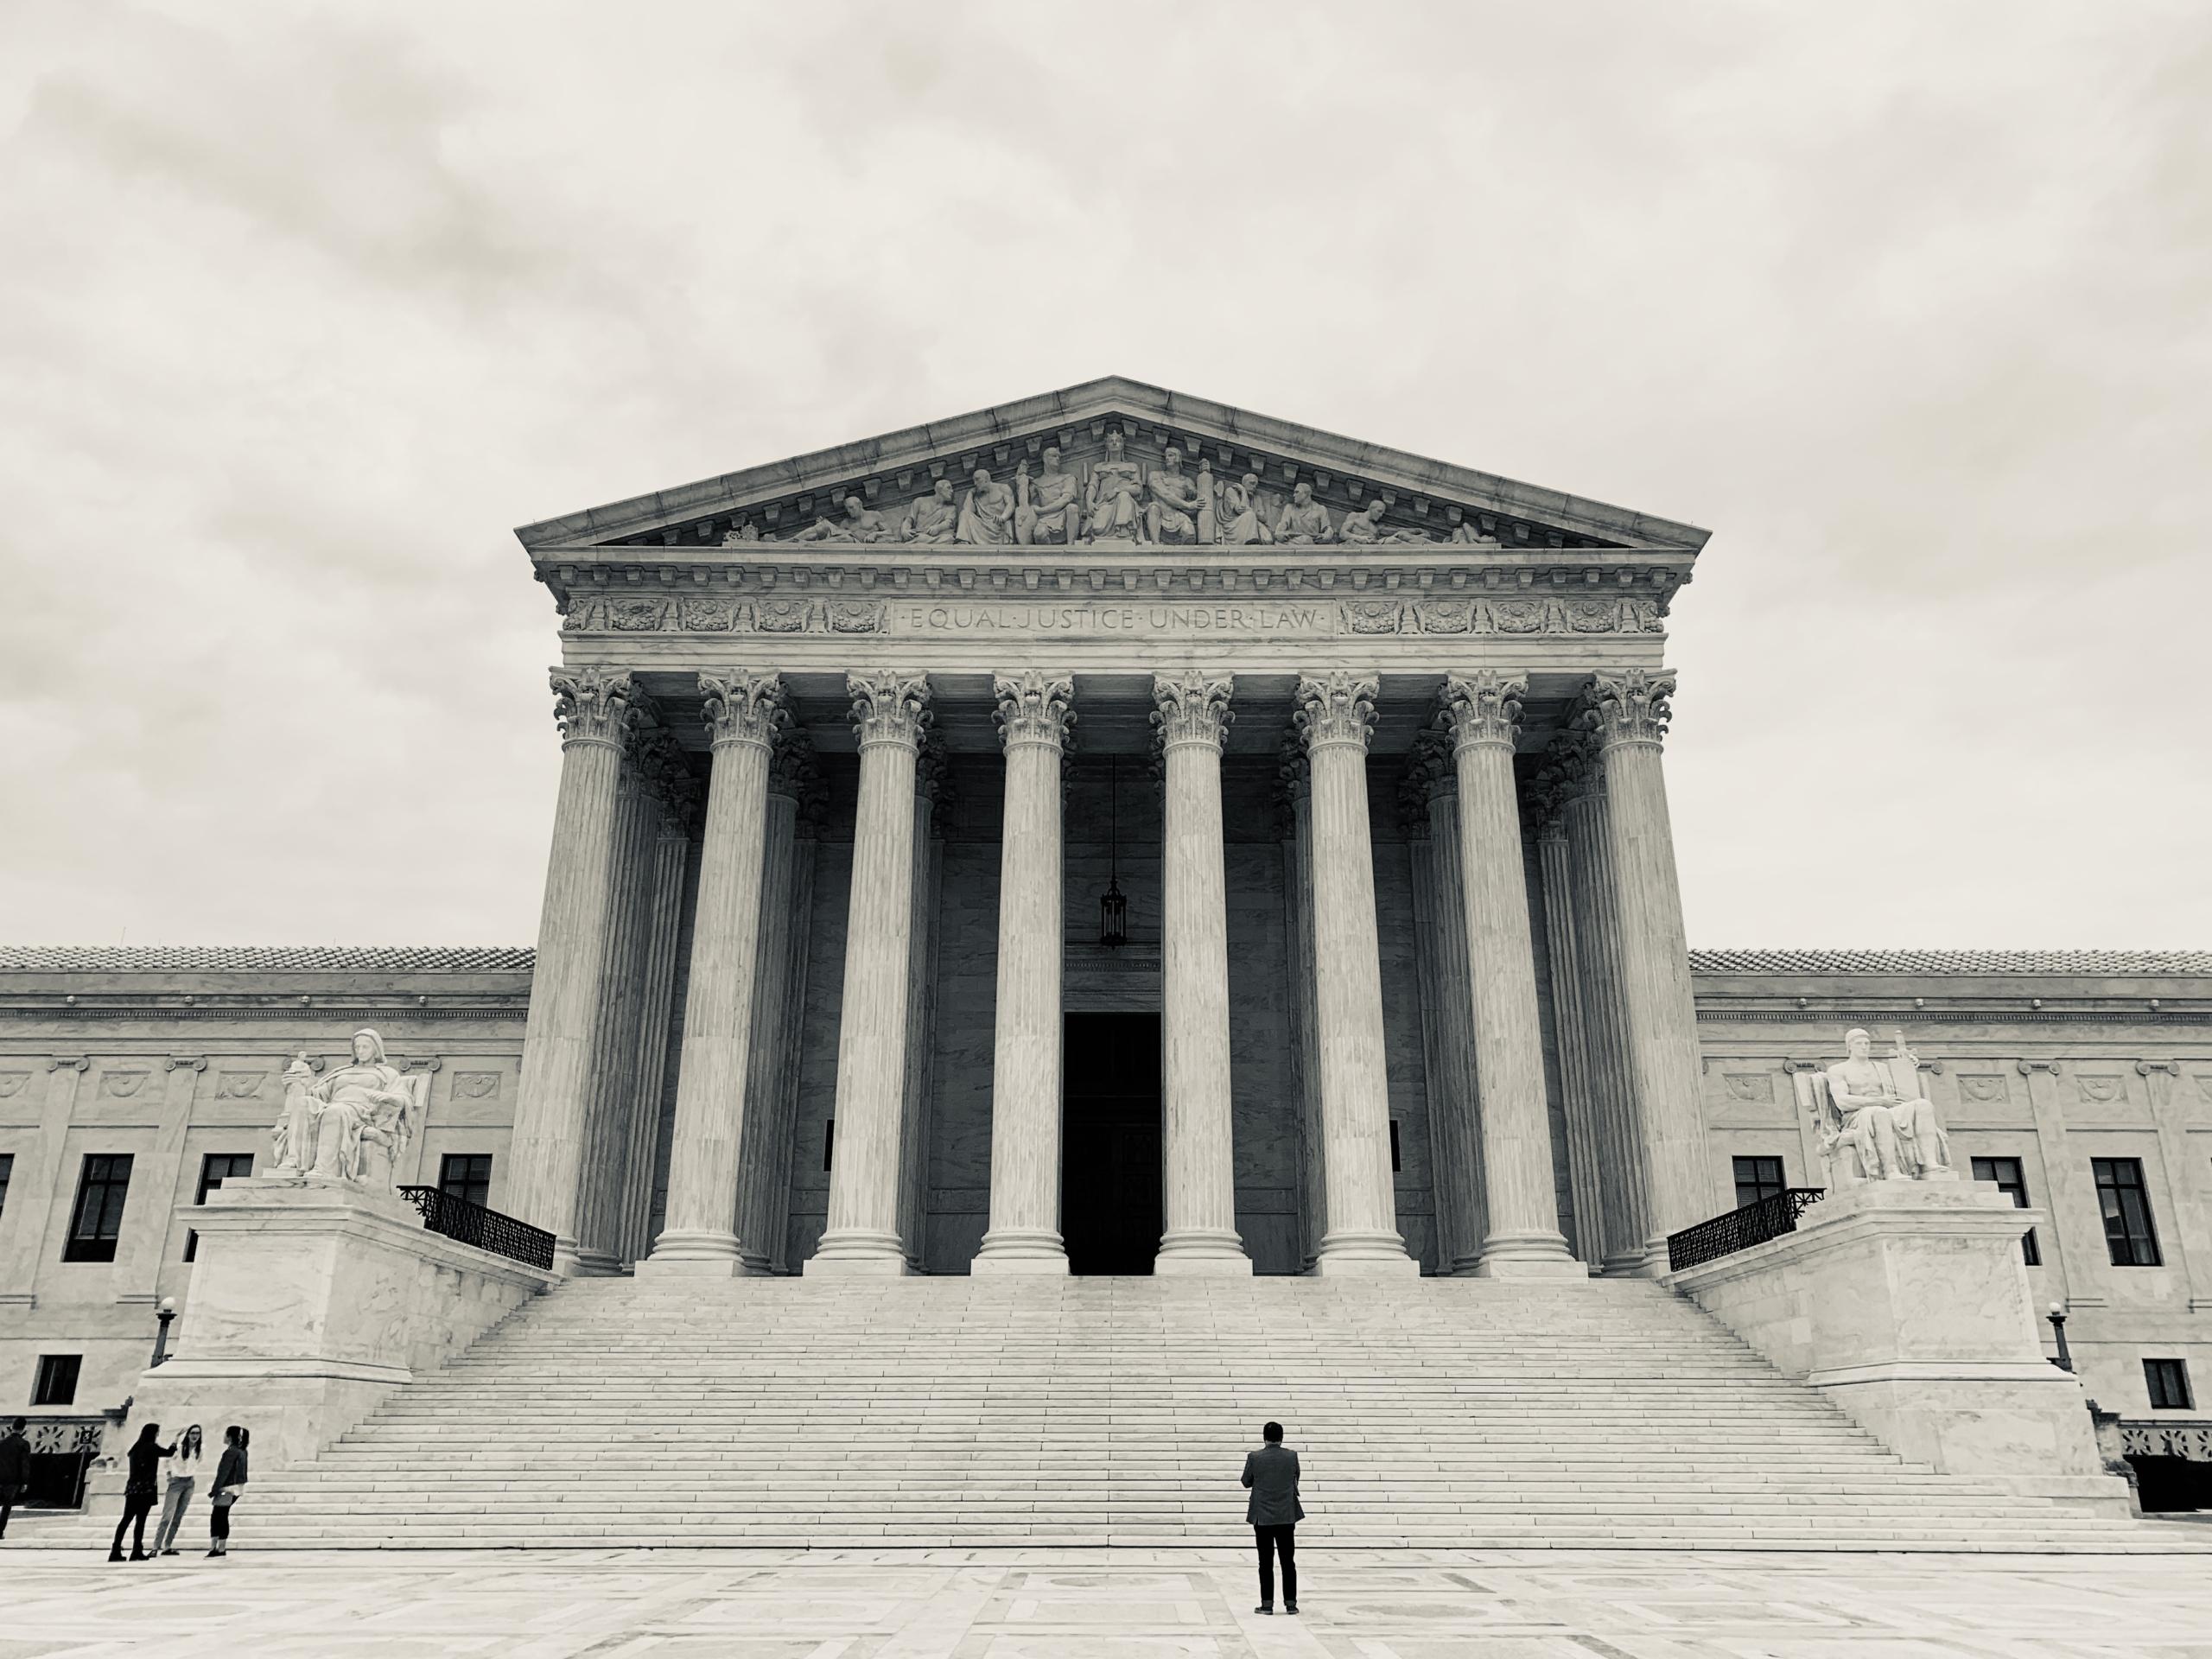 To Faithfully Follow 'Roe': How 'Roe v. Wade' Now Protects Human Life